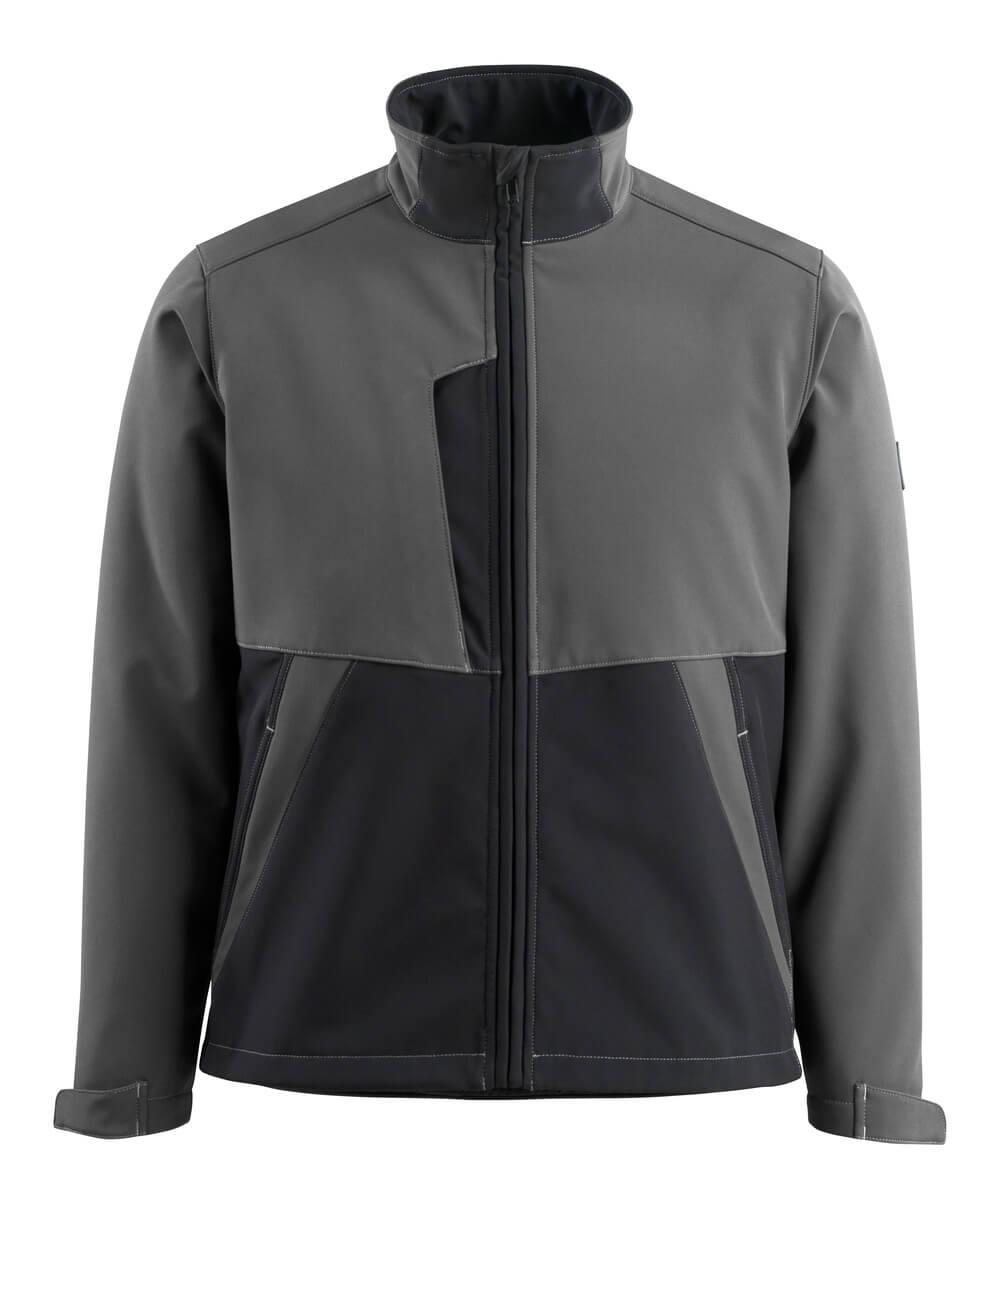 15702-253-1809 Softshell jakke - mørk antracit/sort